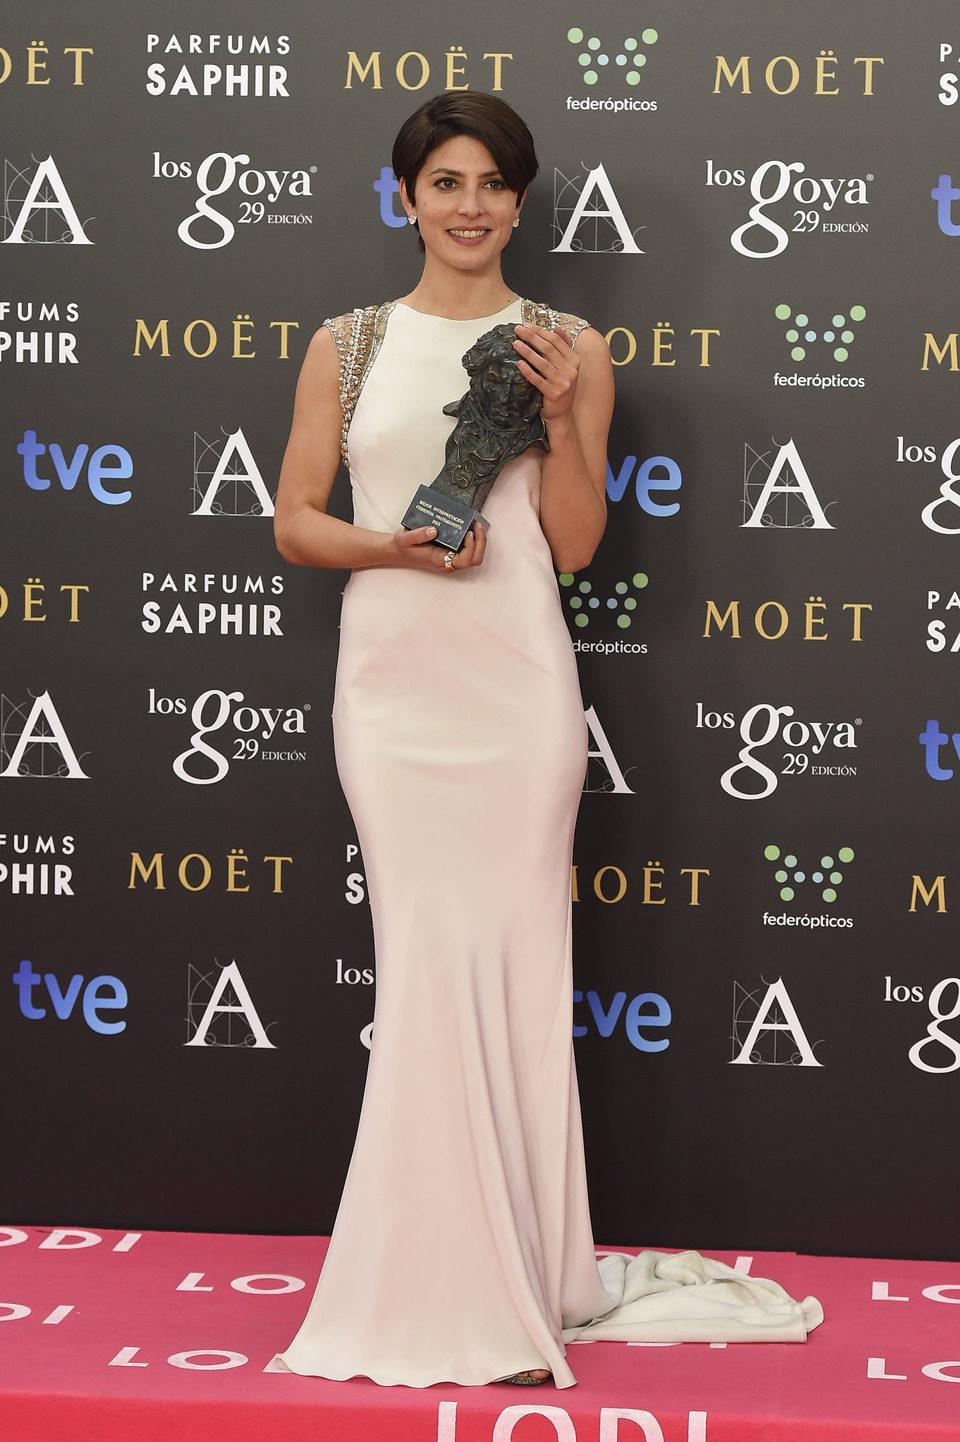 Bárbara Lennie, Goya 2015 a la mejor actriz